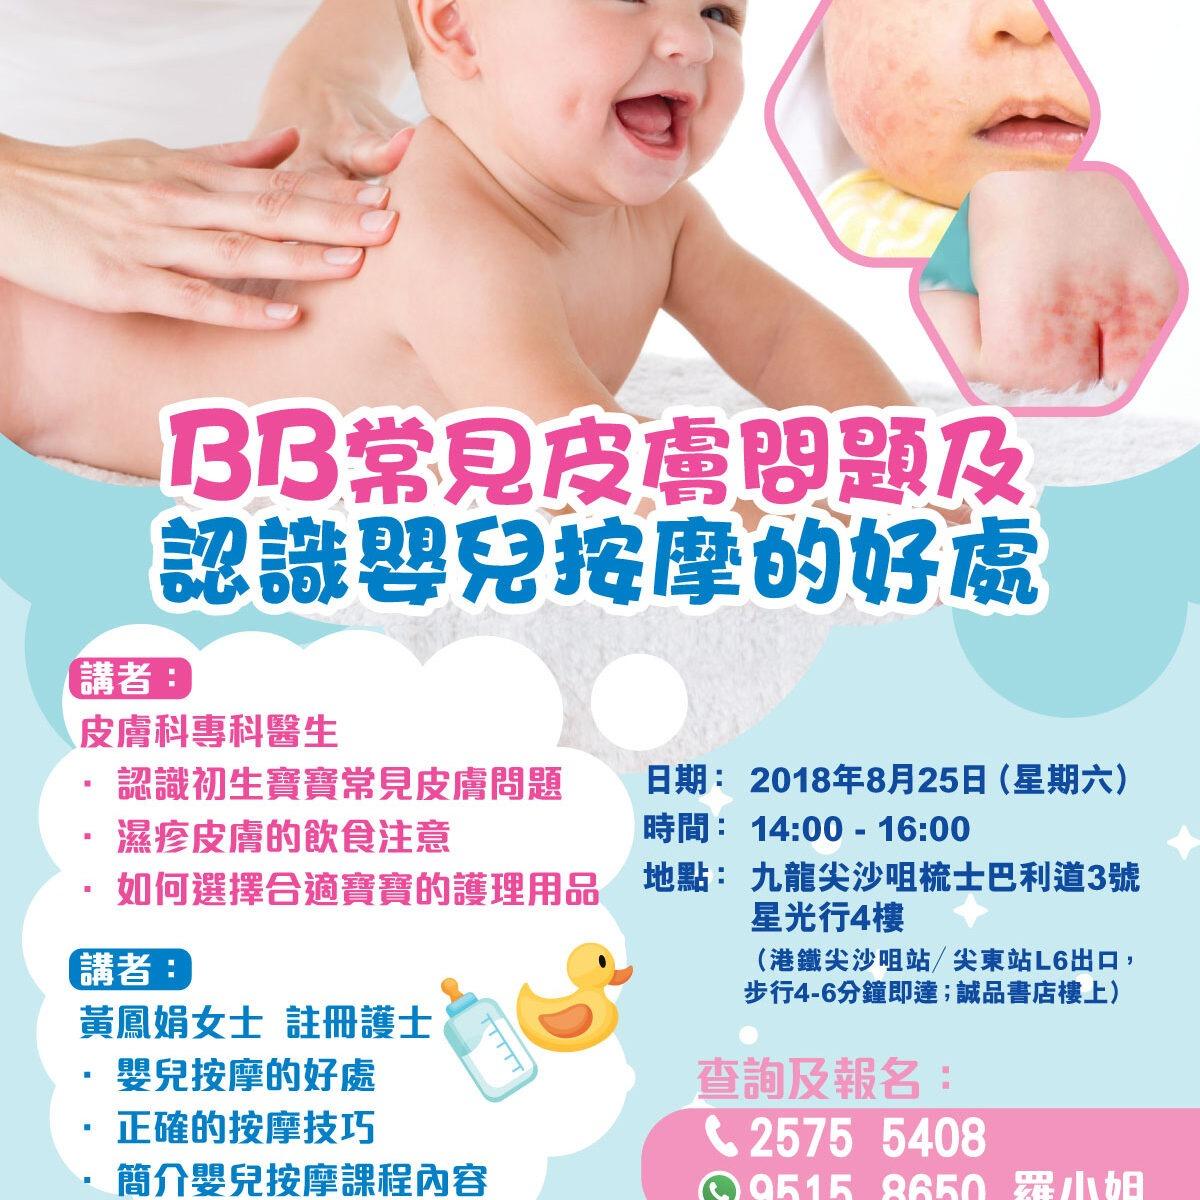 20180825-herobama-講座活動-BB常見皮膚問題及認識嬰兒按摩的好處